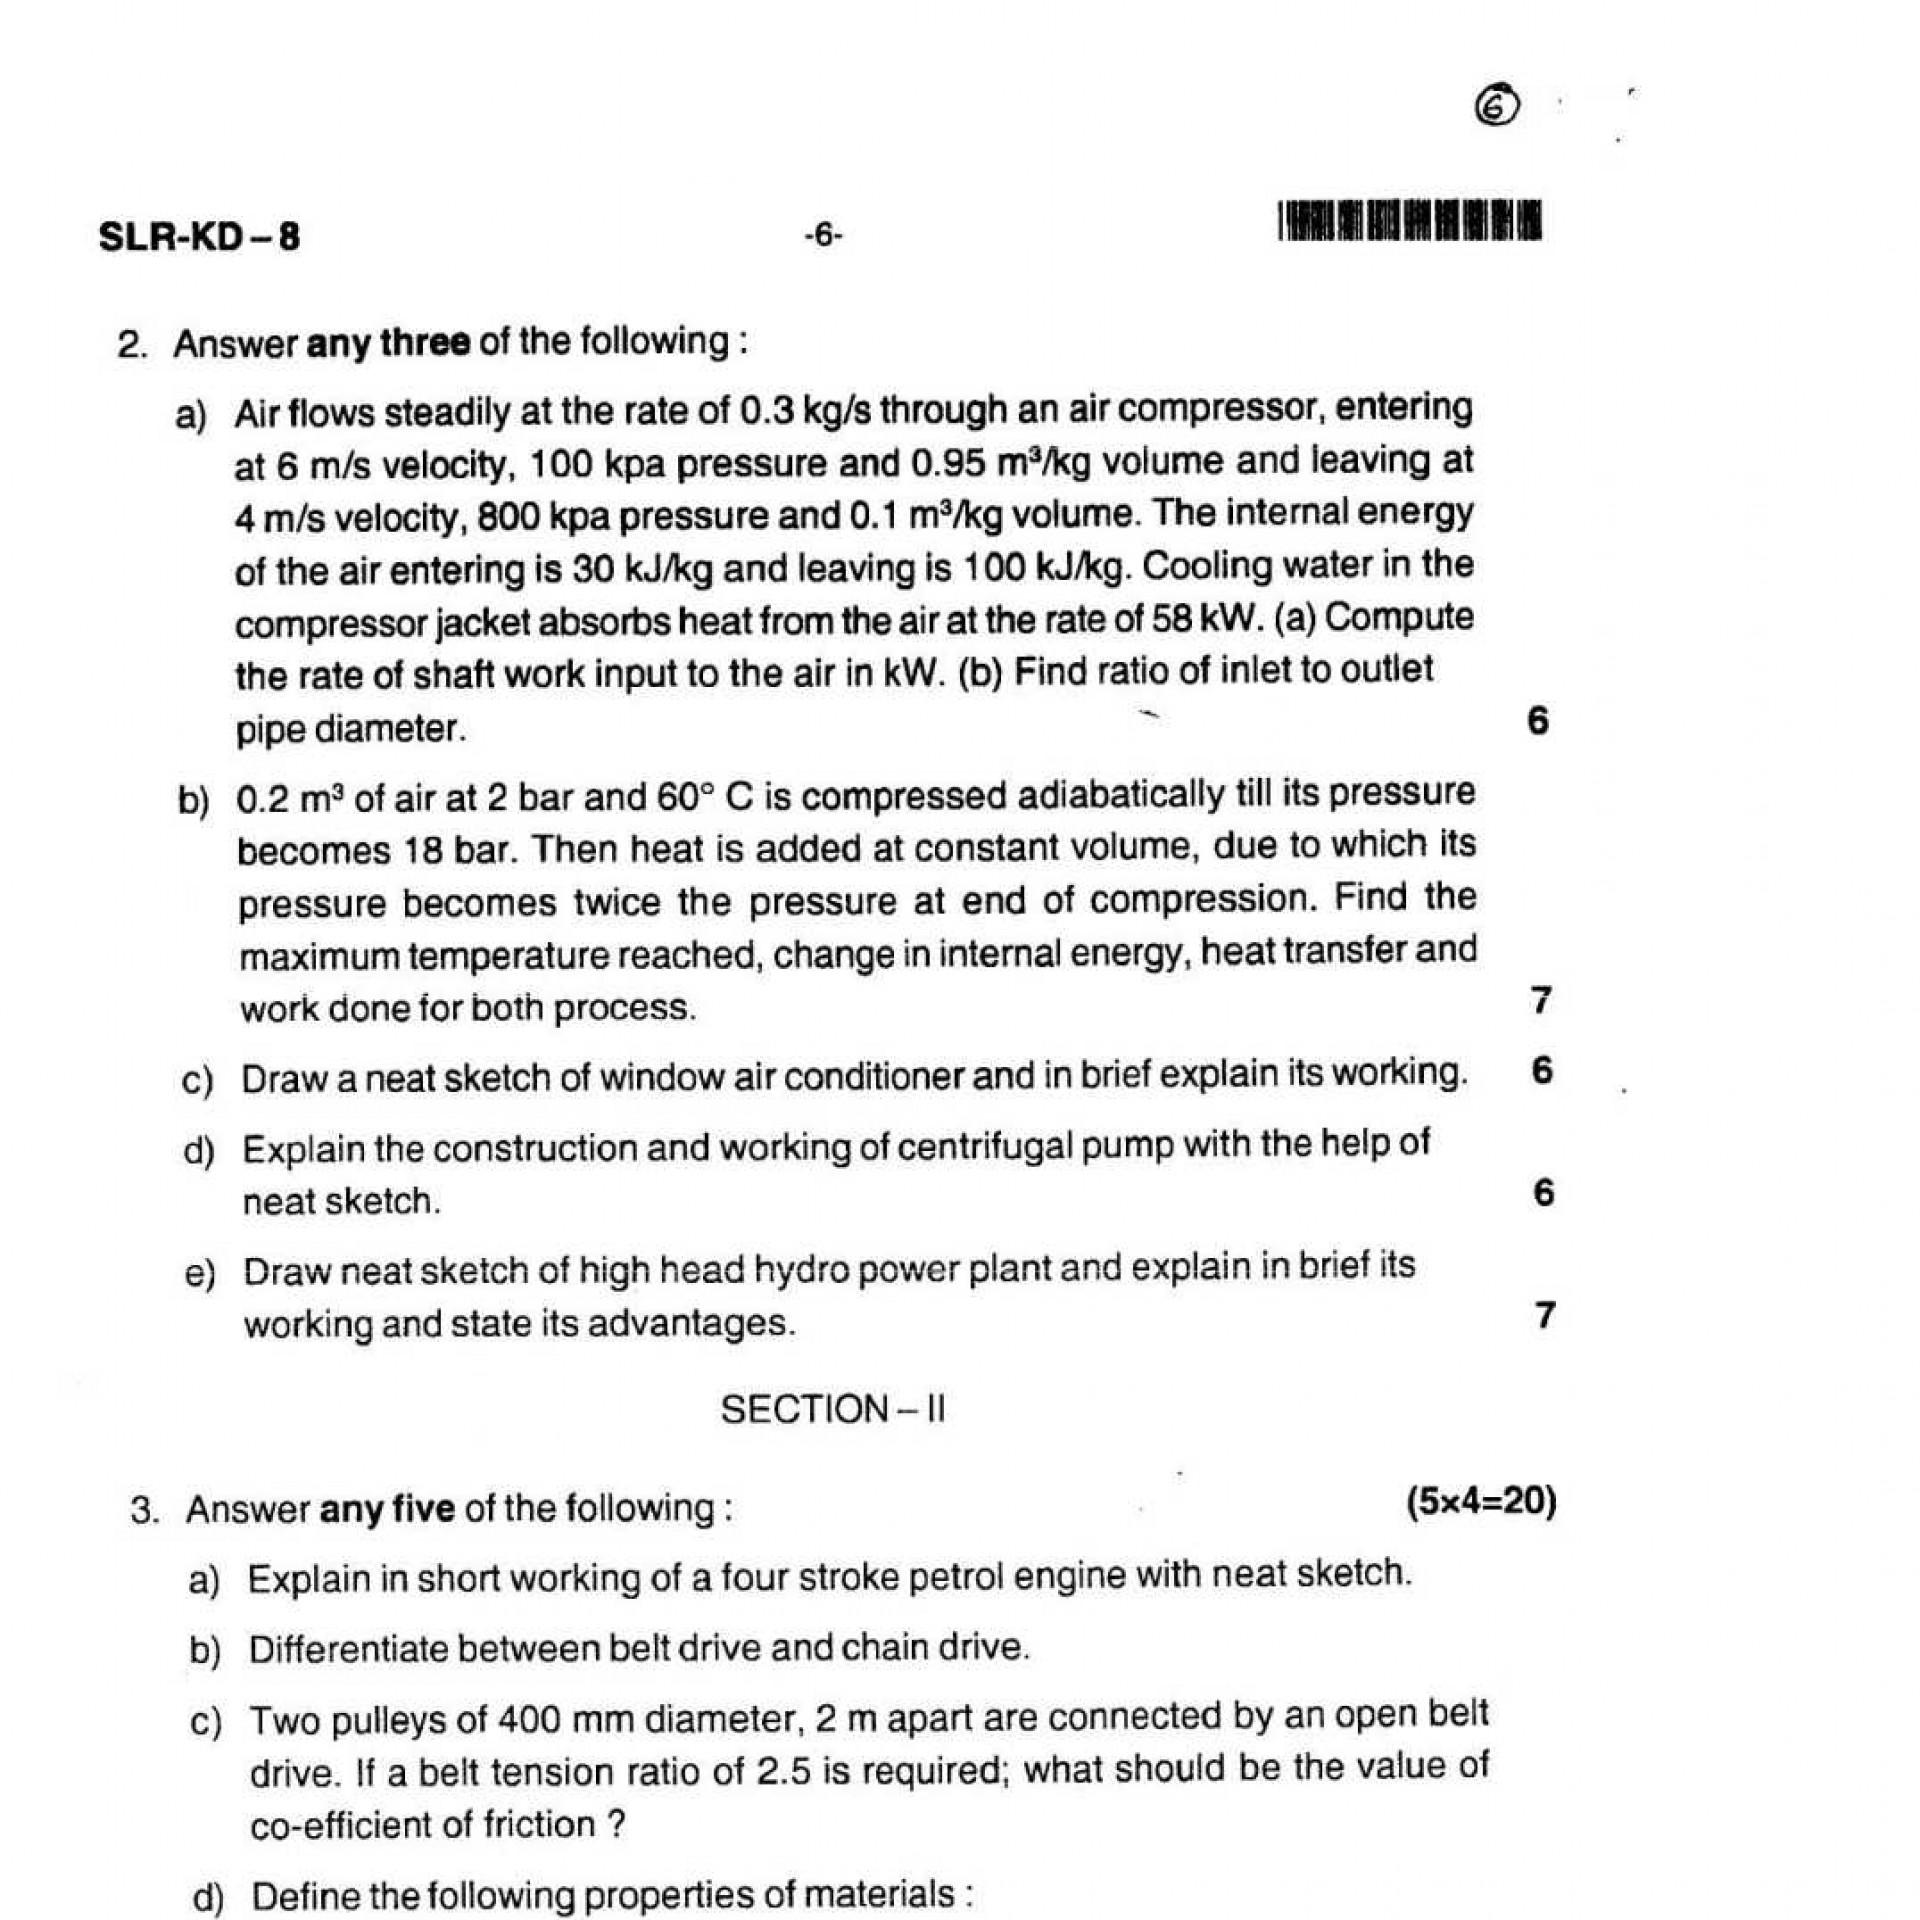 009 Renaissance Essay Example Solapur University Question Papers Surprising Harlem Introduction Sample Pdf 1920